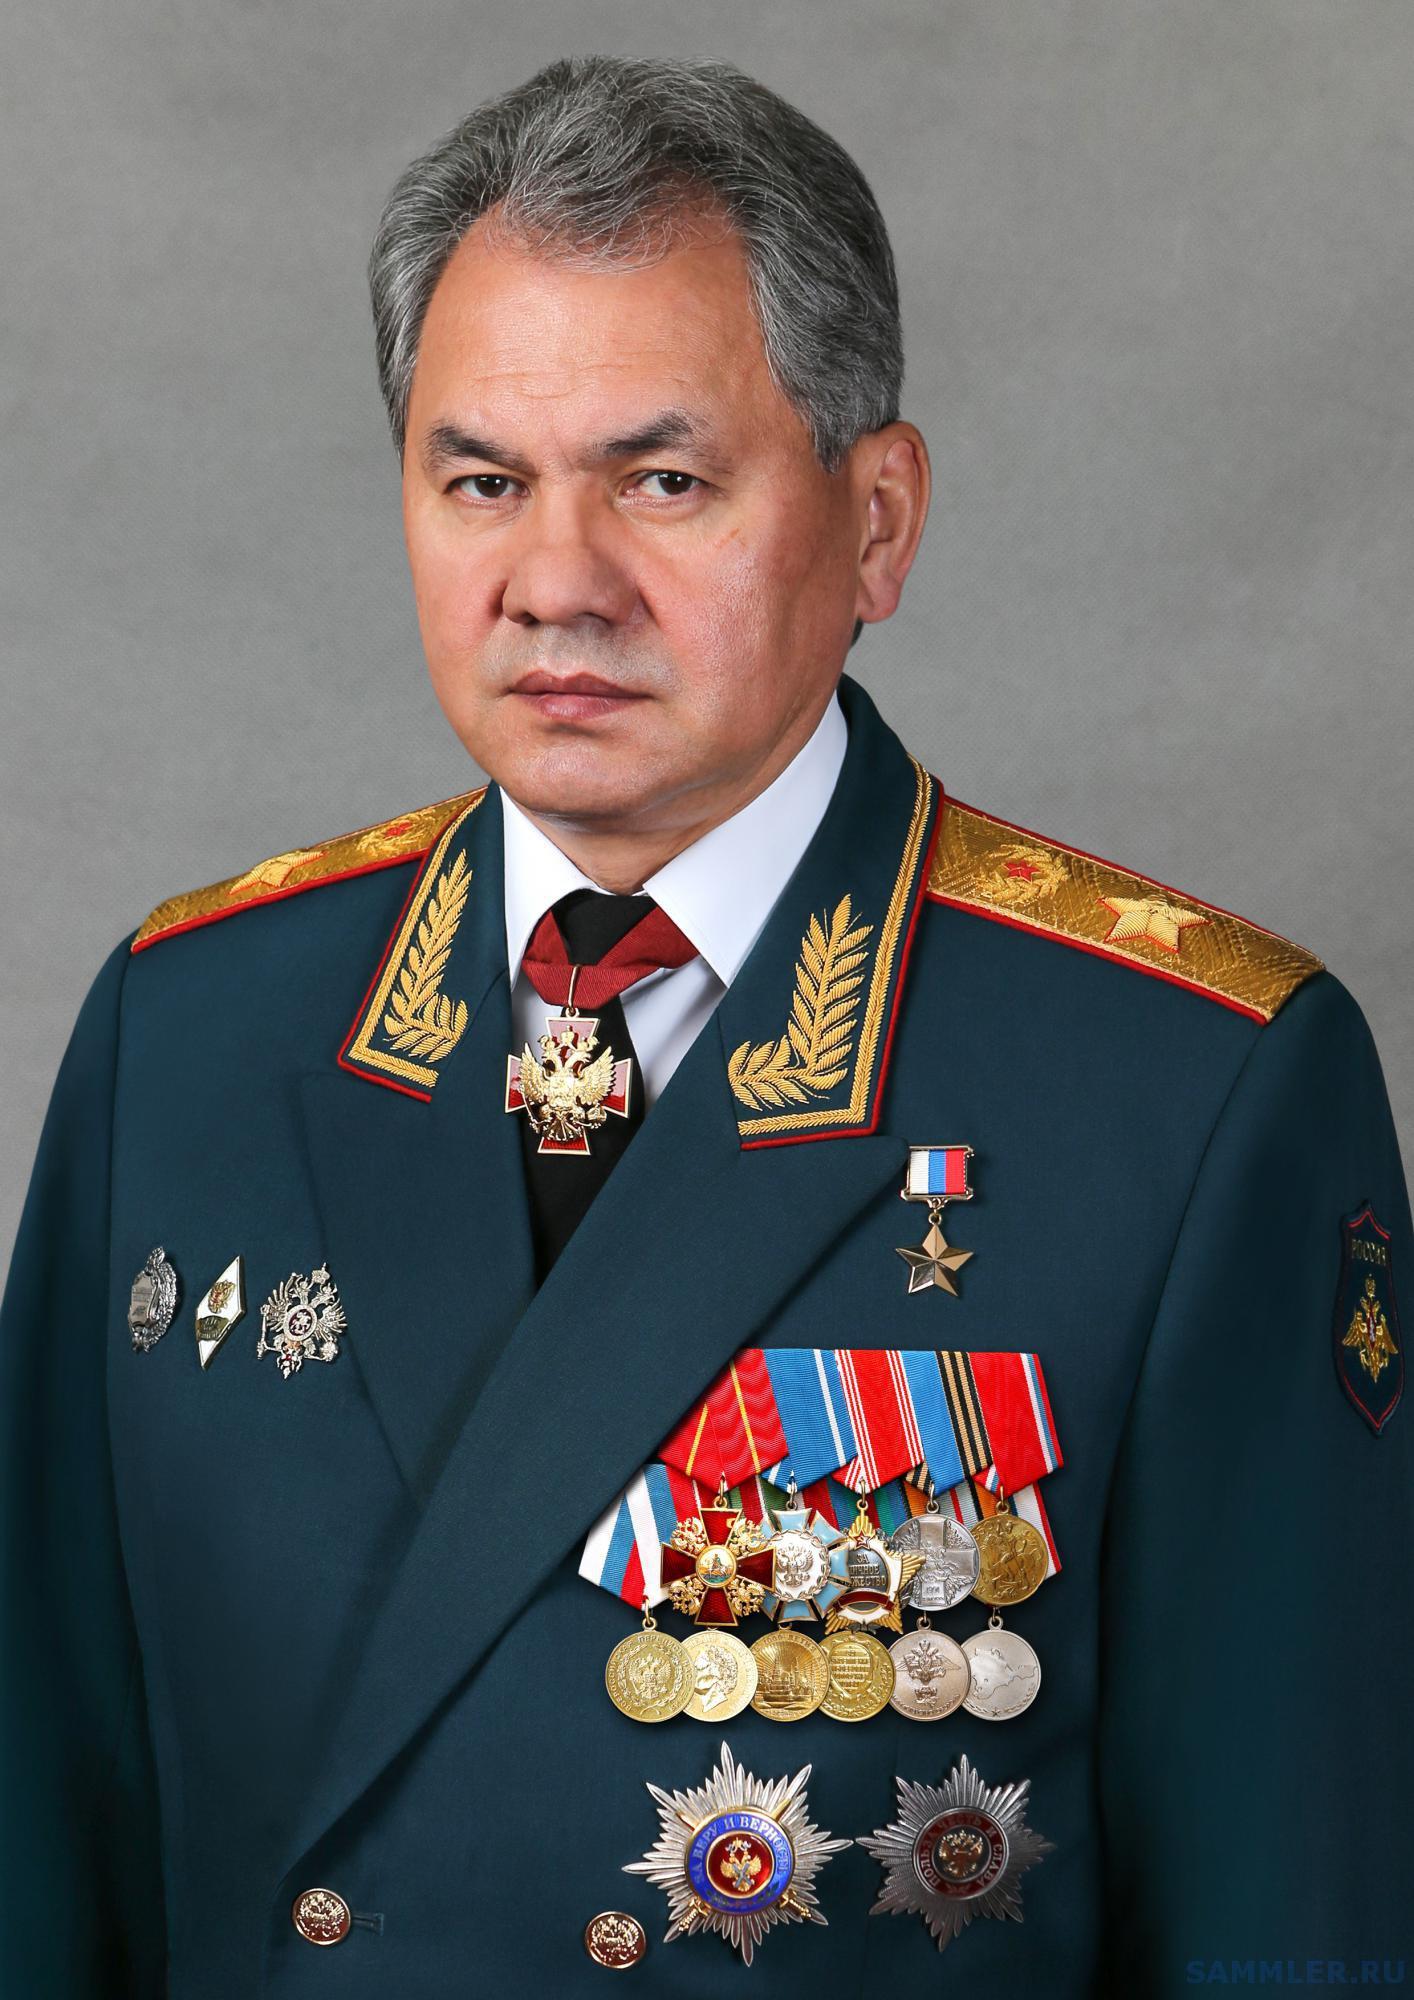 Шойгу Сергей Кожугетович - официальное фото 2015 - 3.jpg